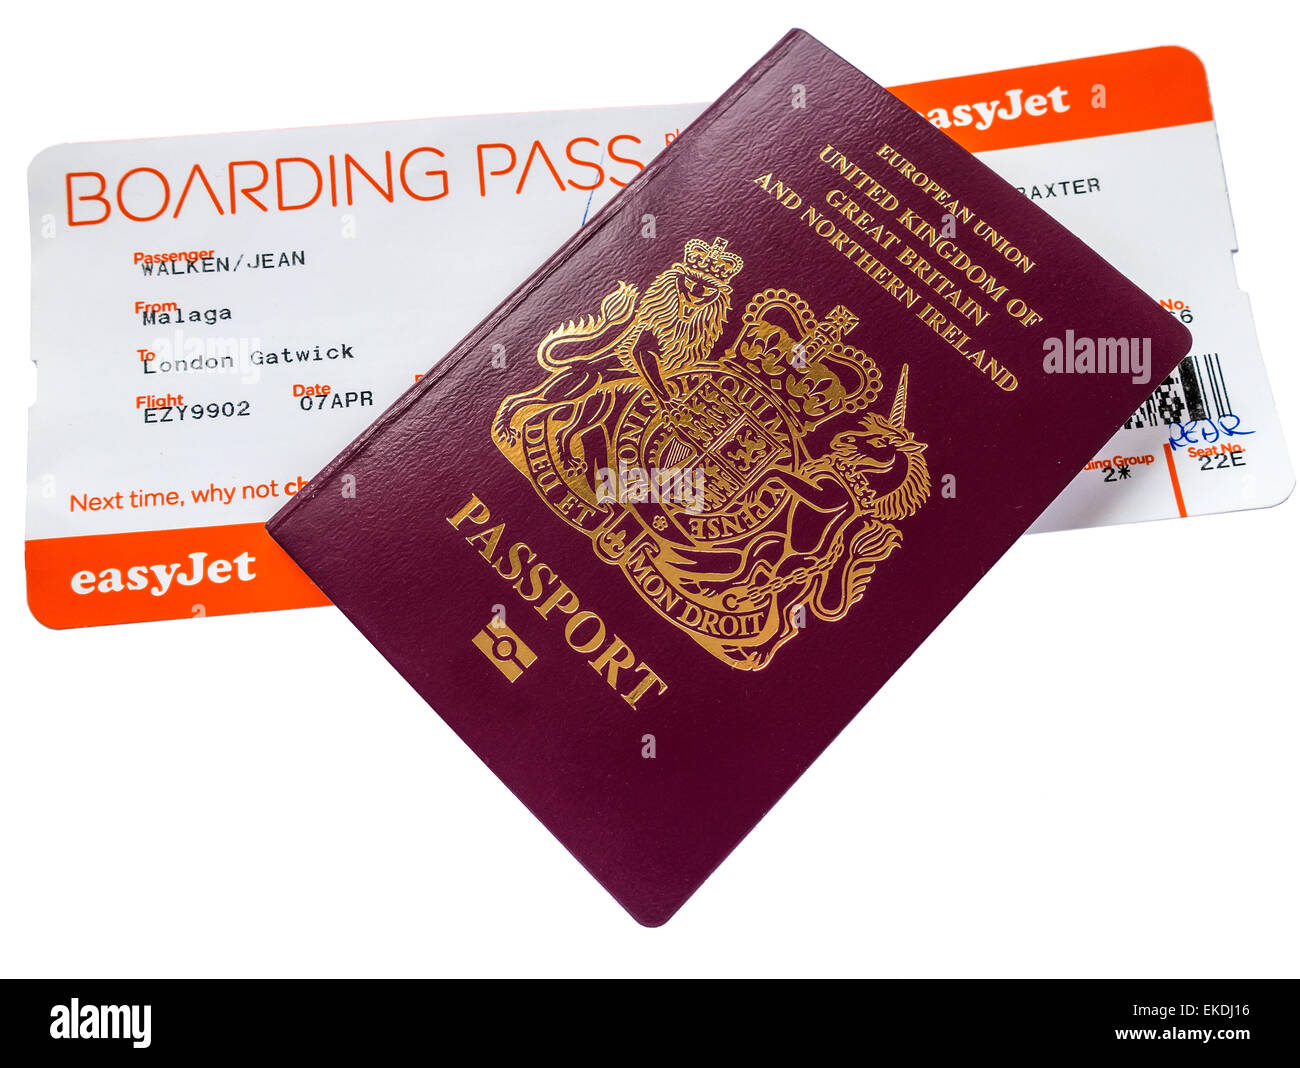 Easyjet Boarding Pass British European Union EU Passport - Stock Image